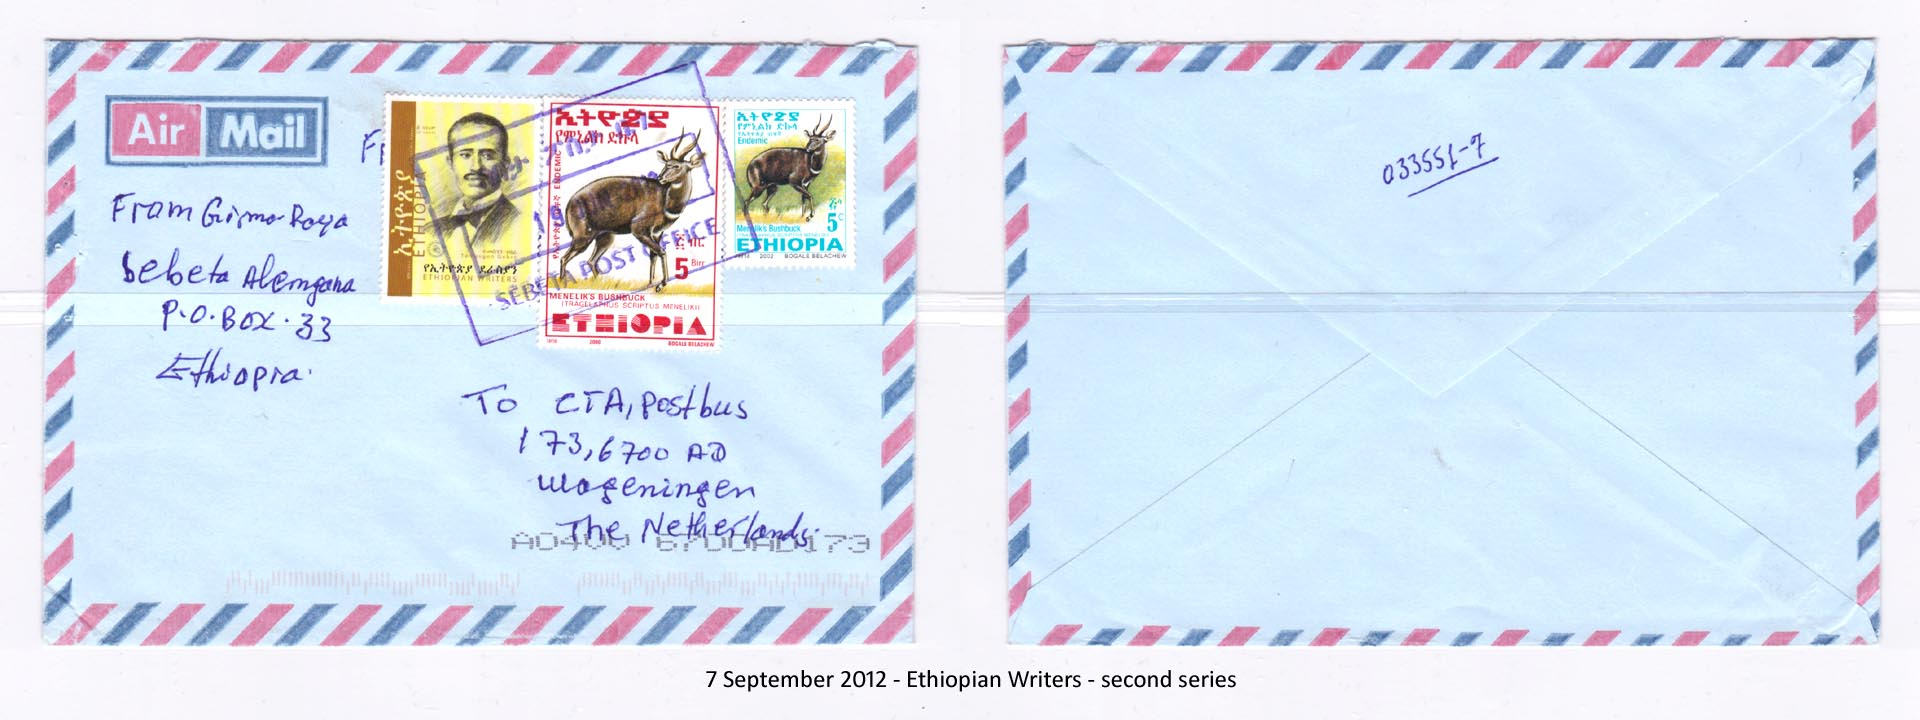 20120907 - Ethiopian Writers - second series